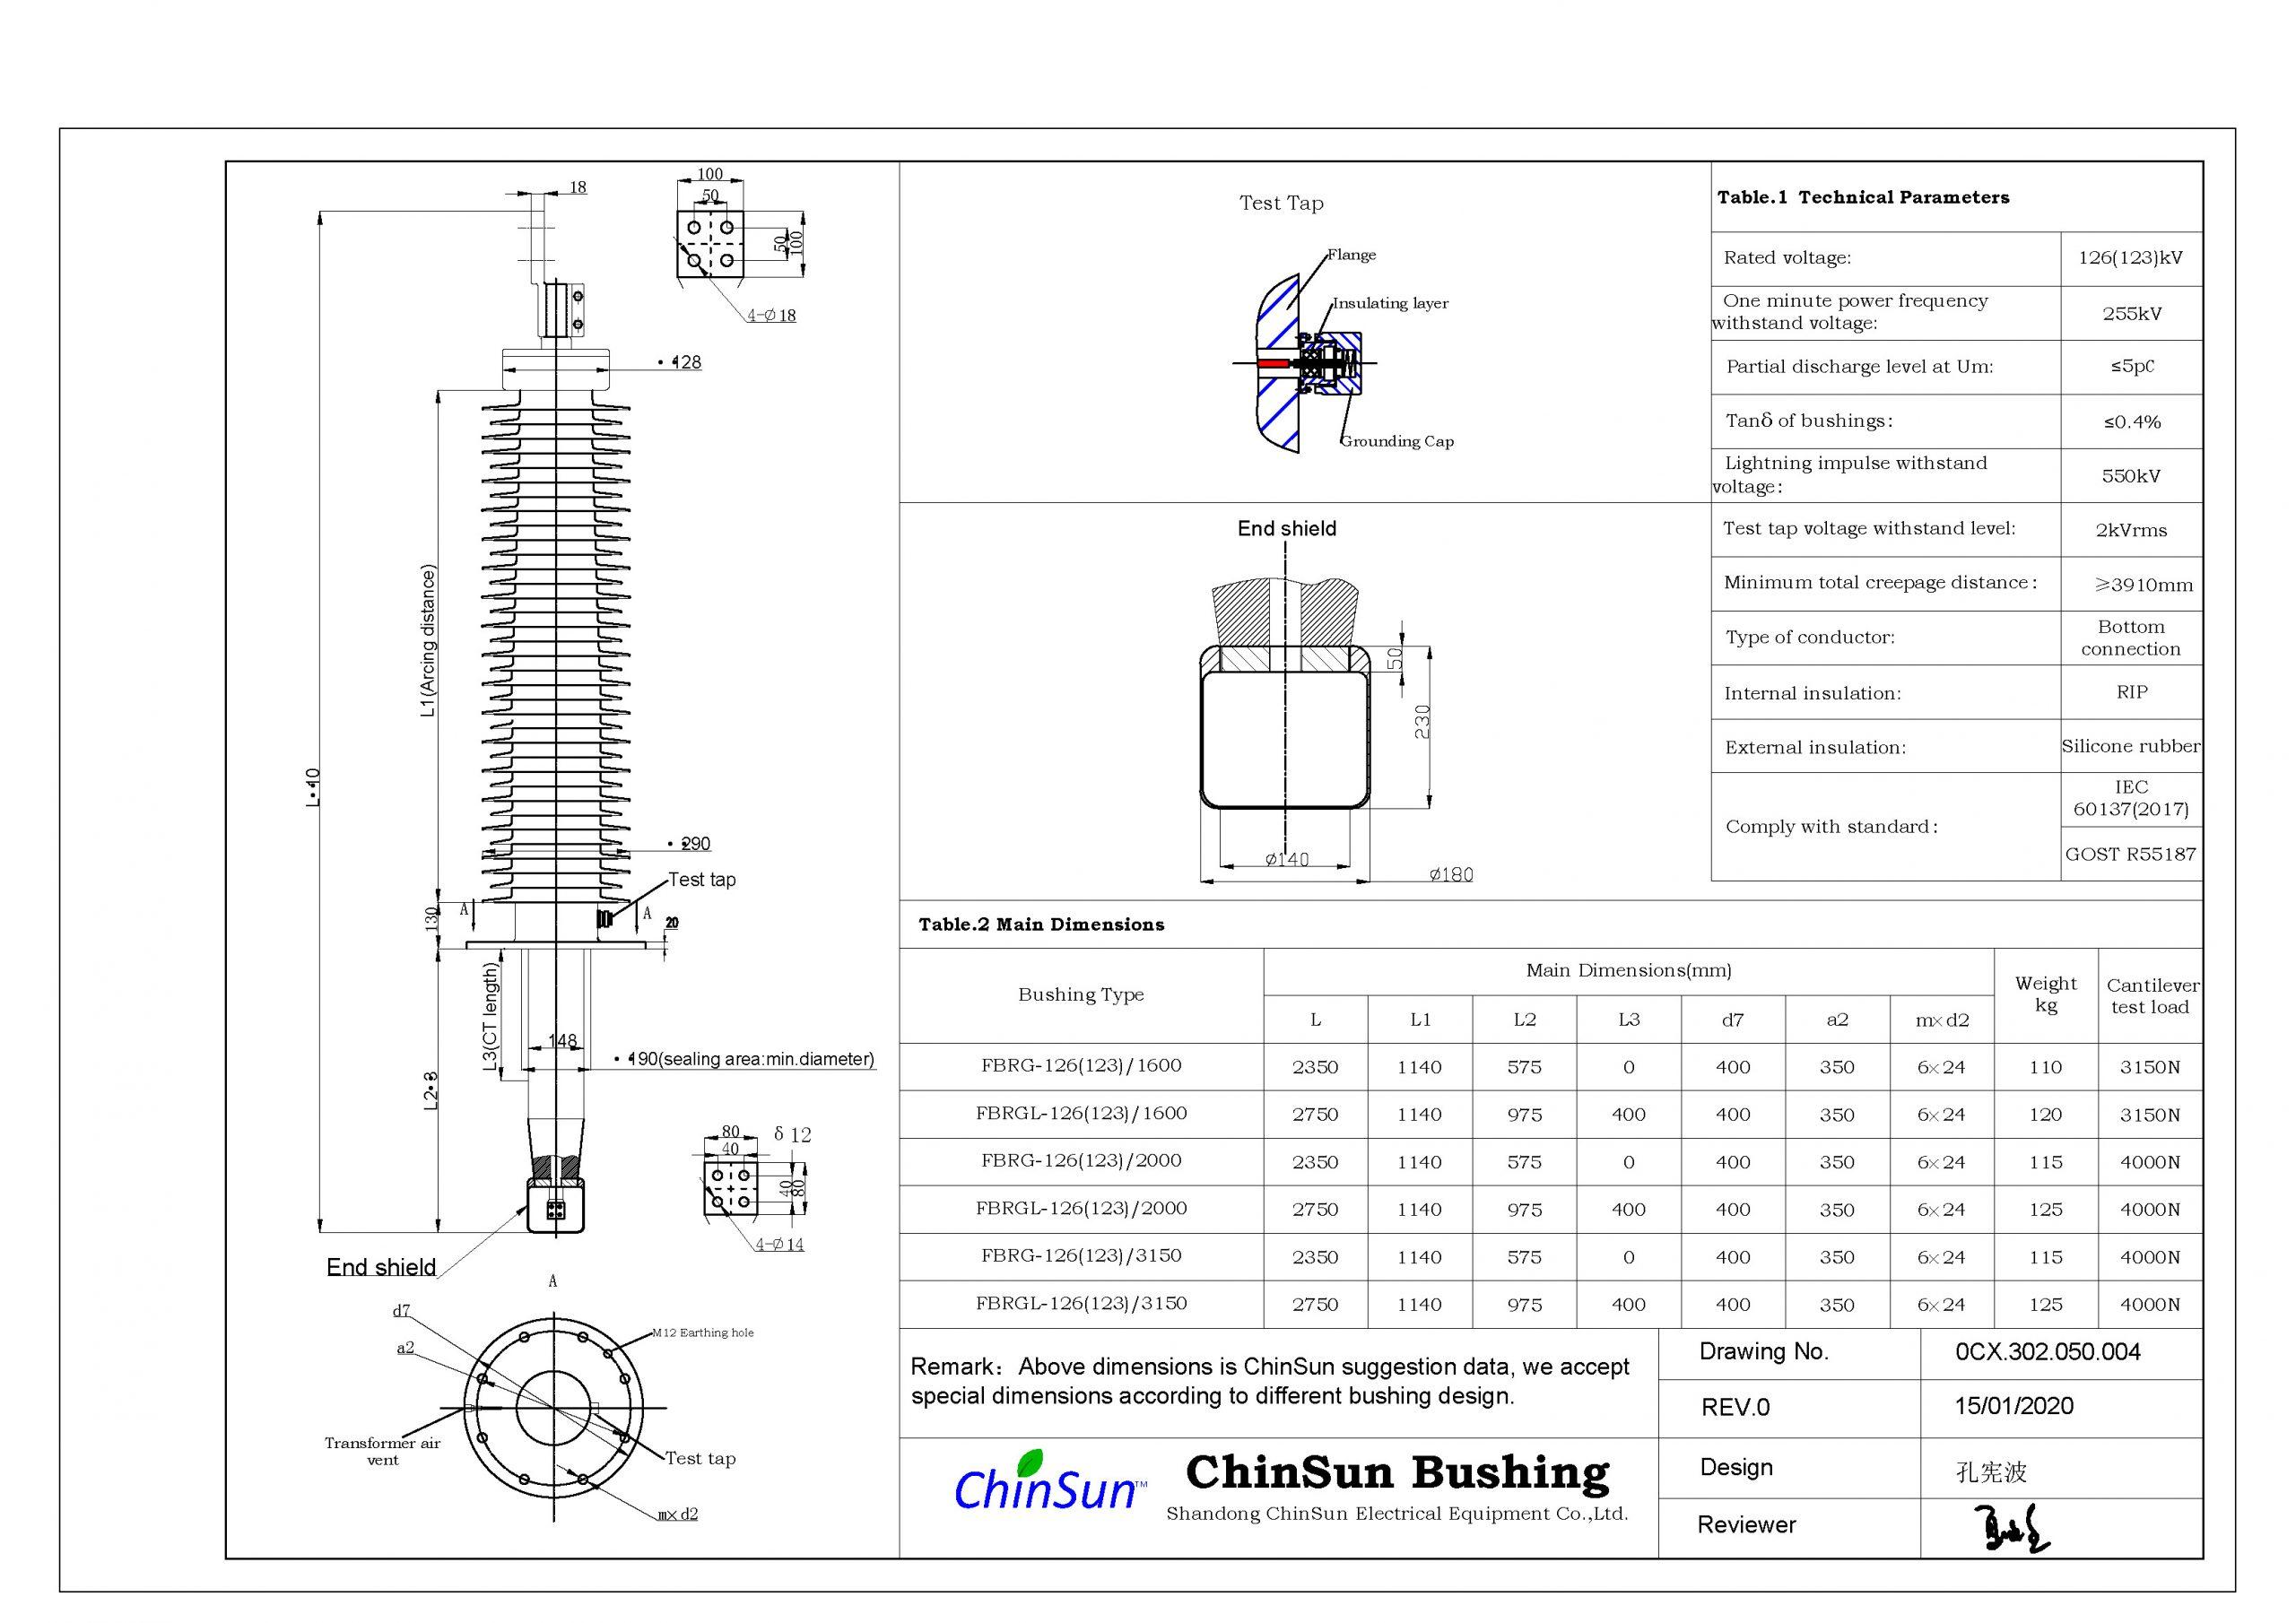 Drawing-transformer bushing-126(123)kV_Silicone rubber-BC-ChinSun